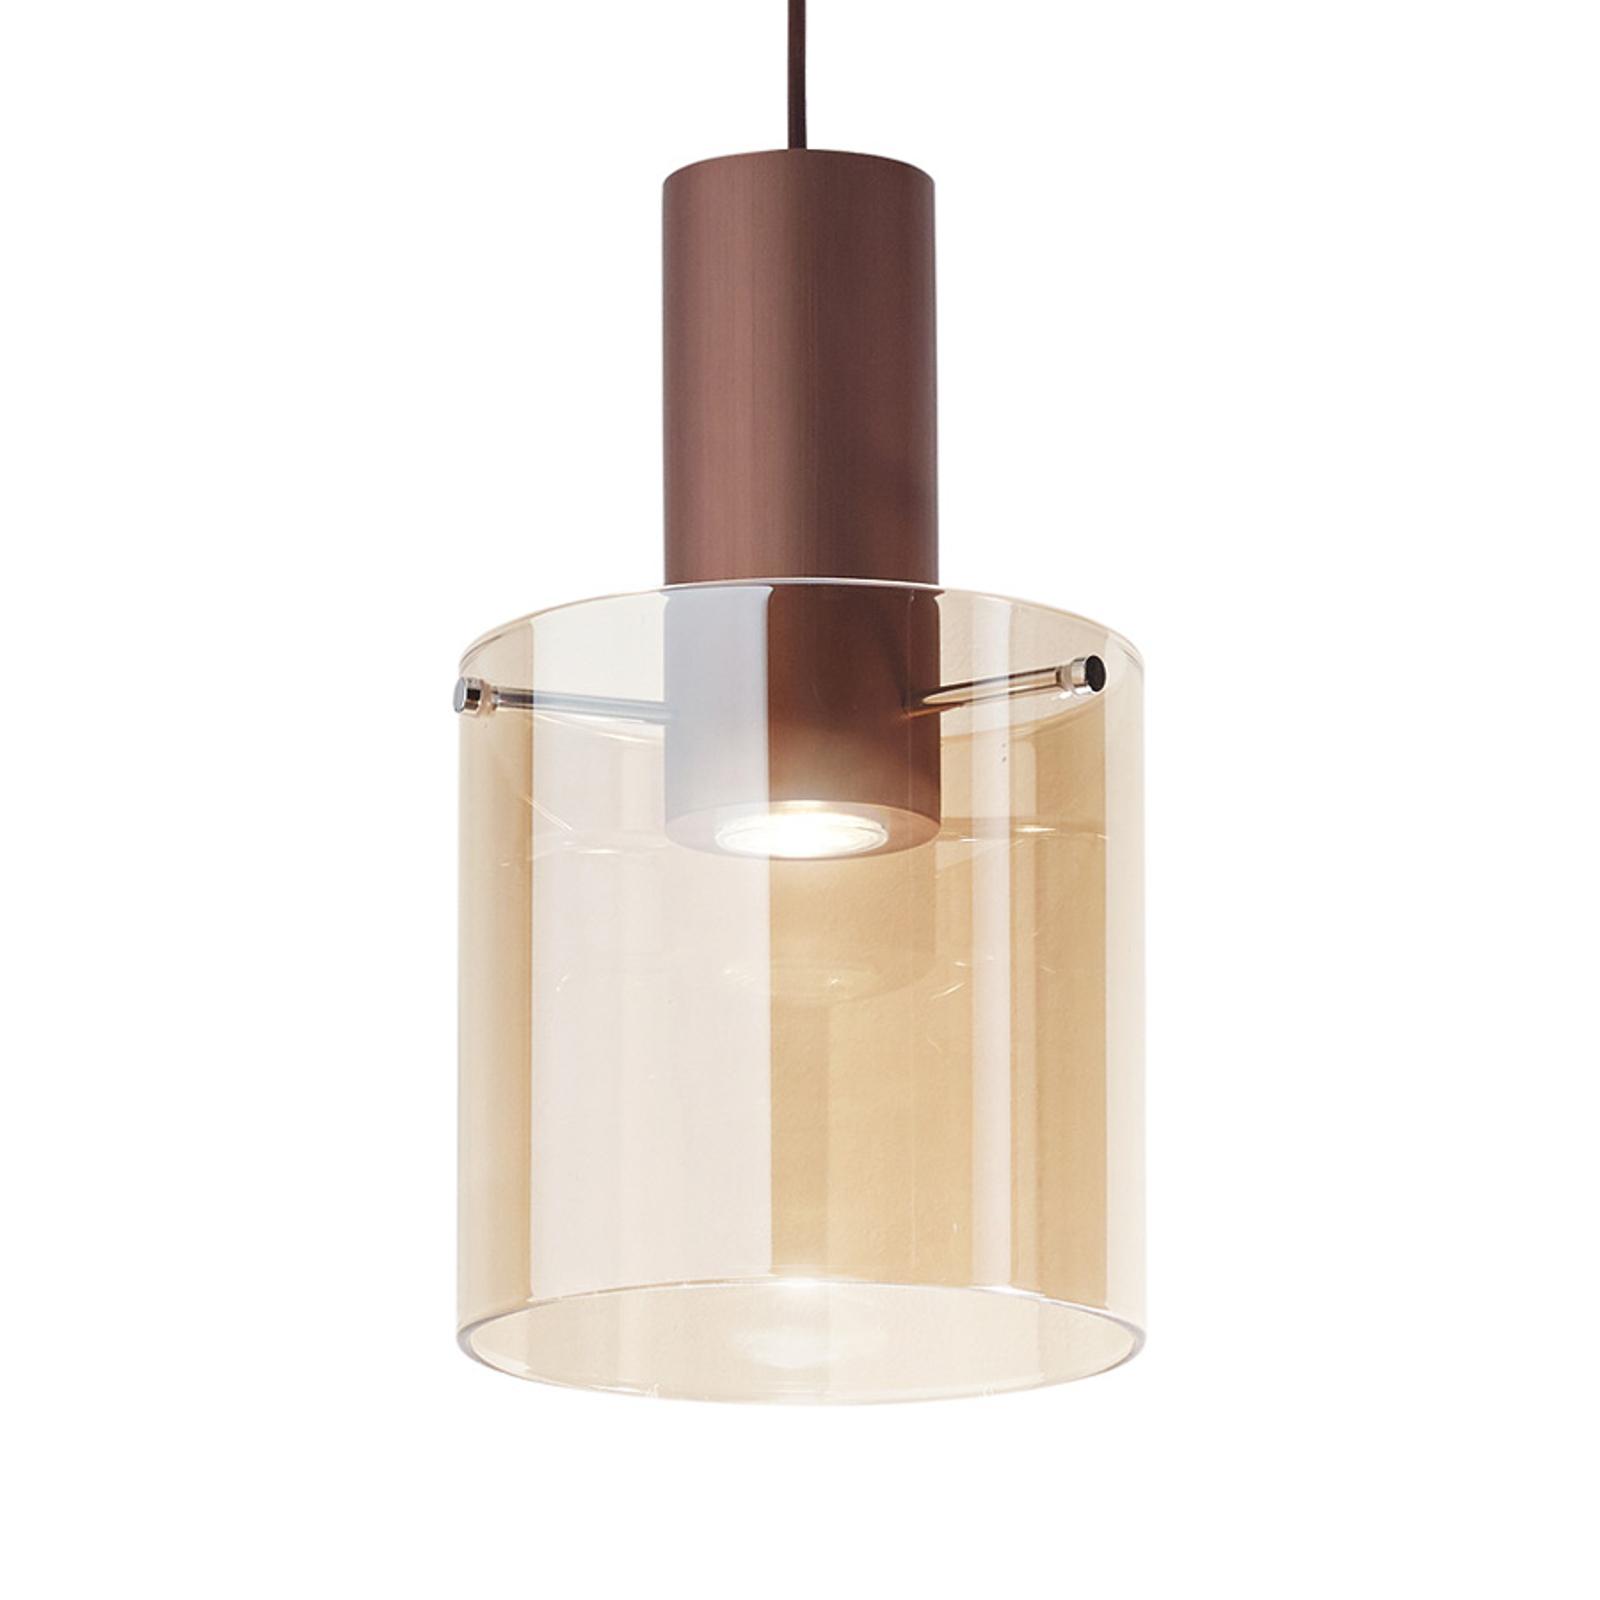 Hanglamp Hugo, ophanging koper, glas amber